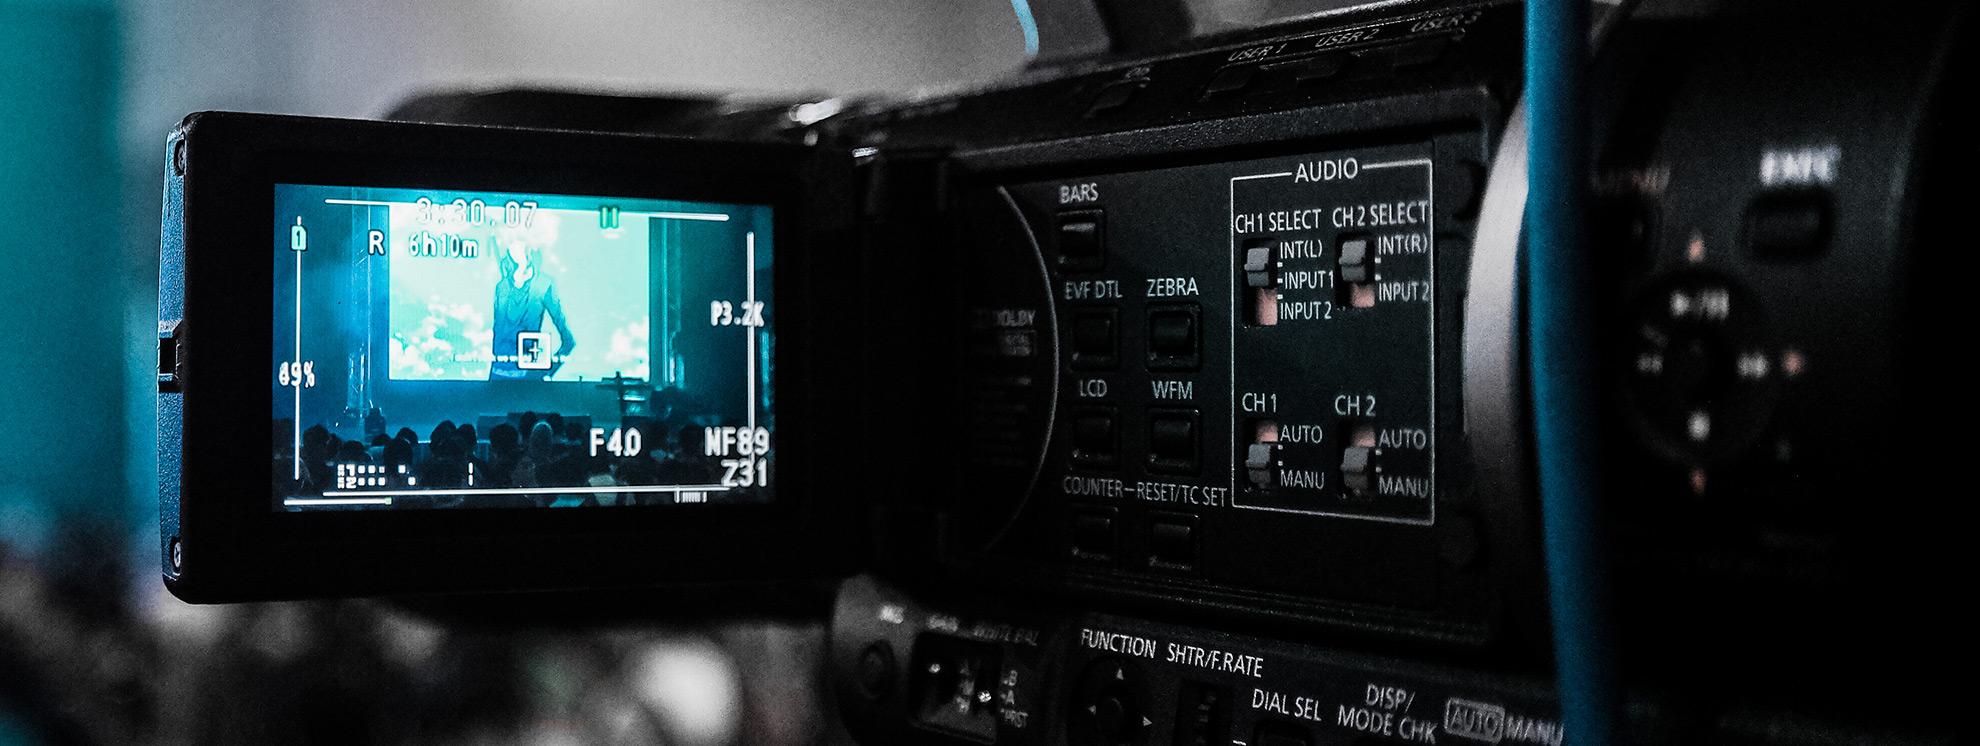 070-Video-Editing-1